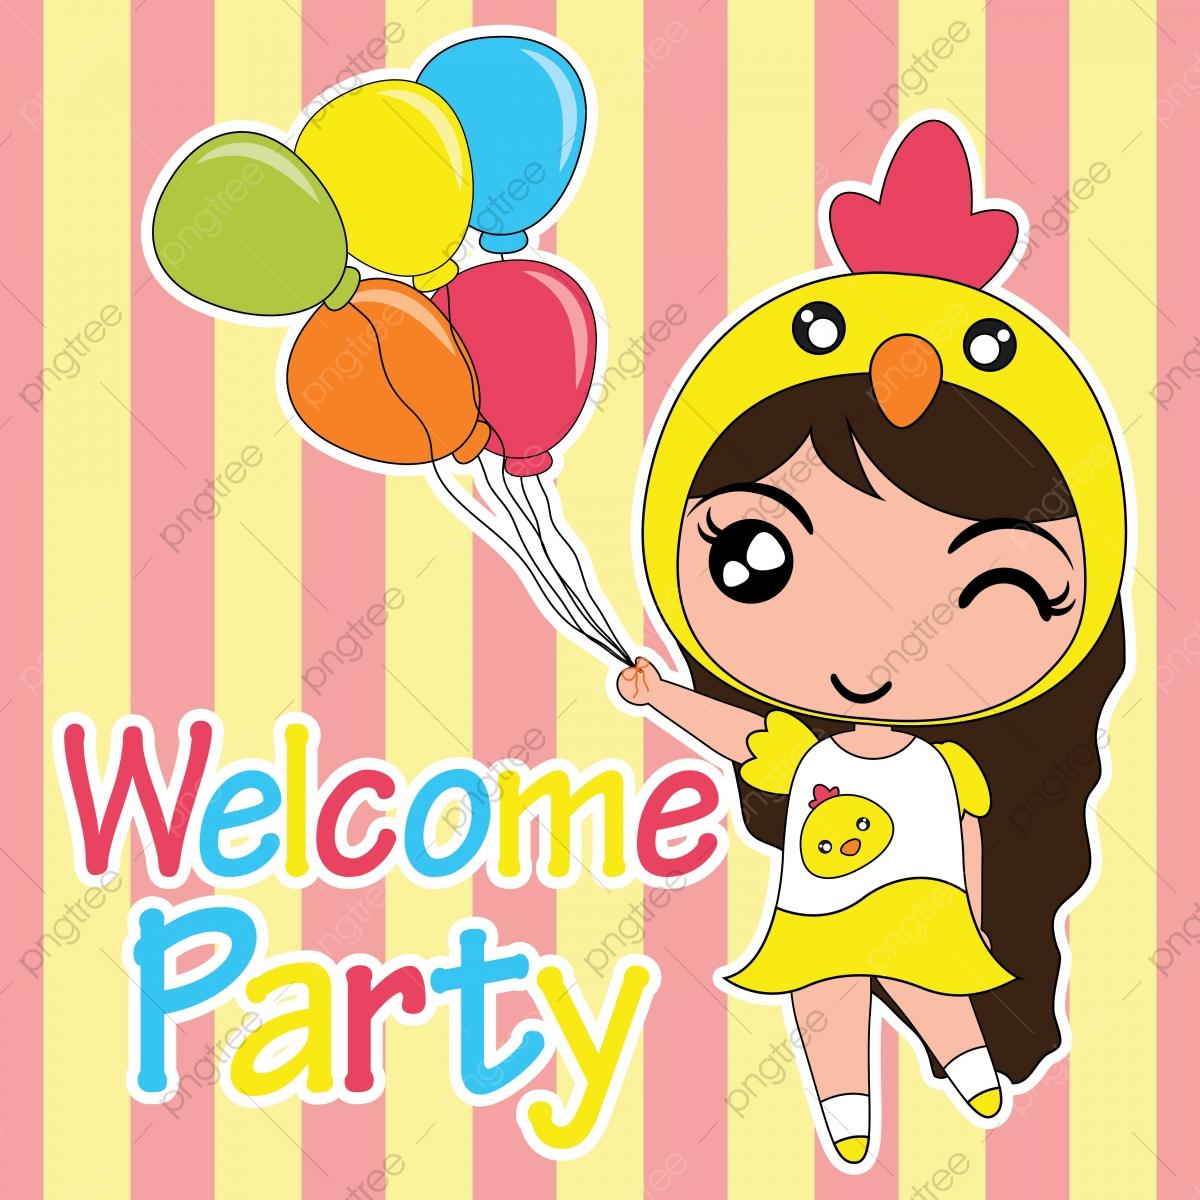 Cute Chick Girl Brings Balloons Cartoon Illustration For